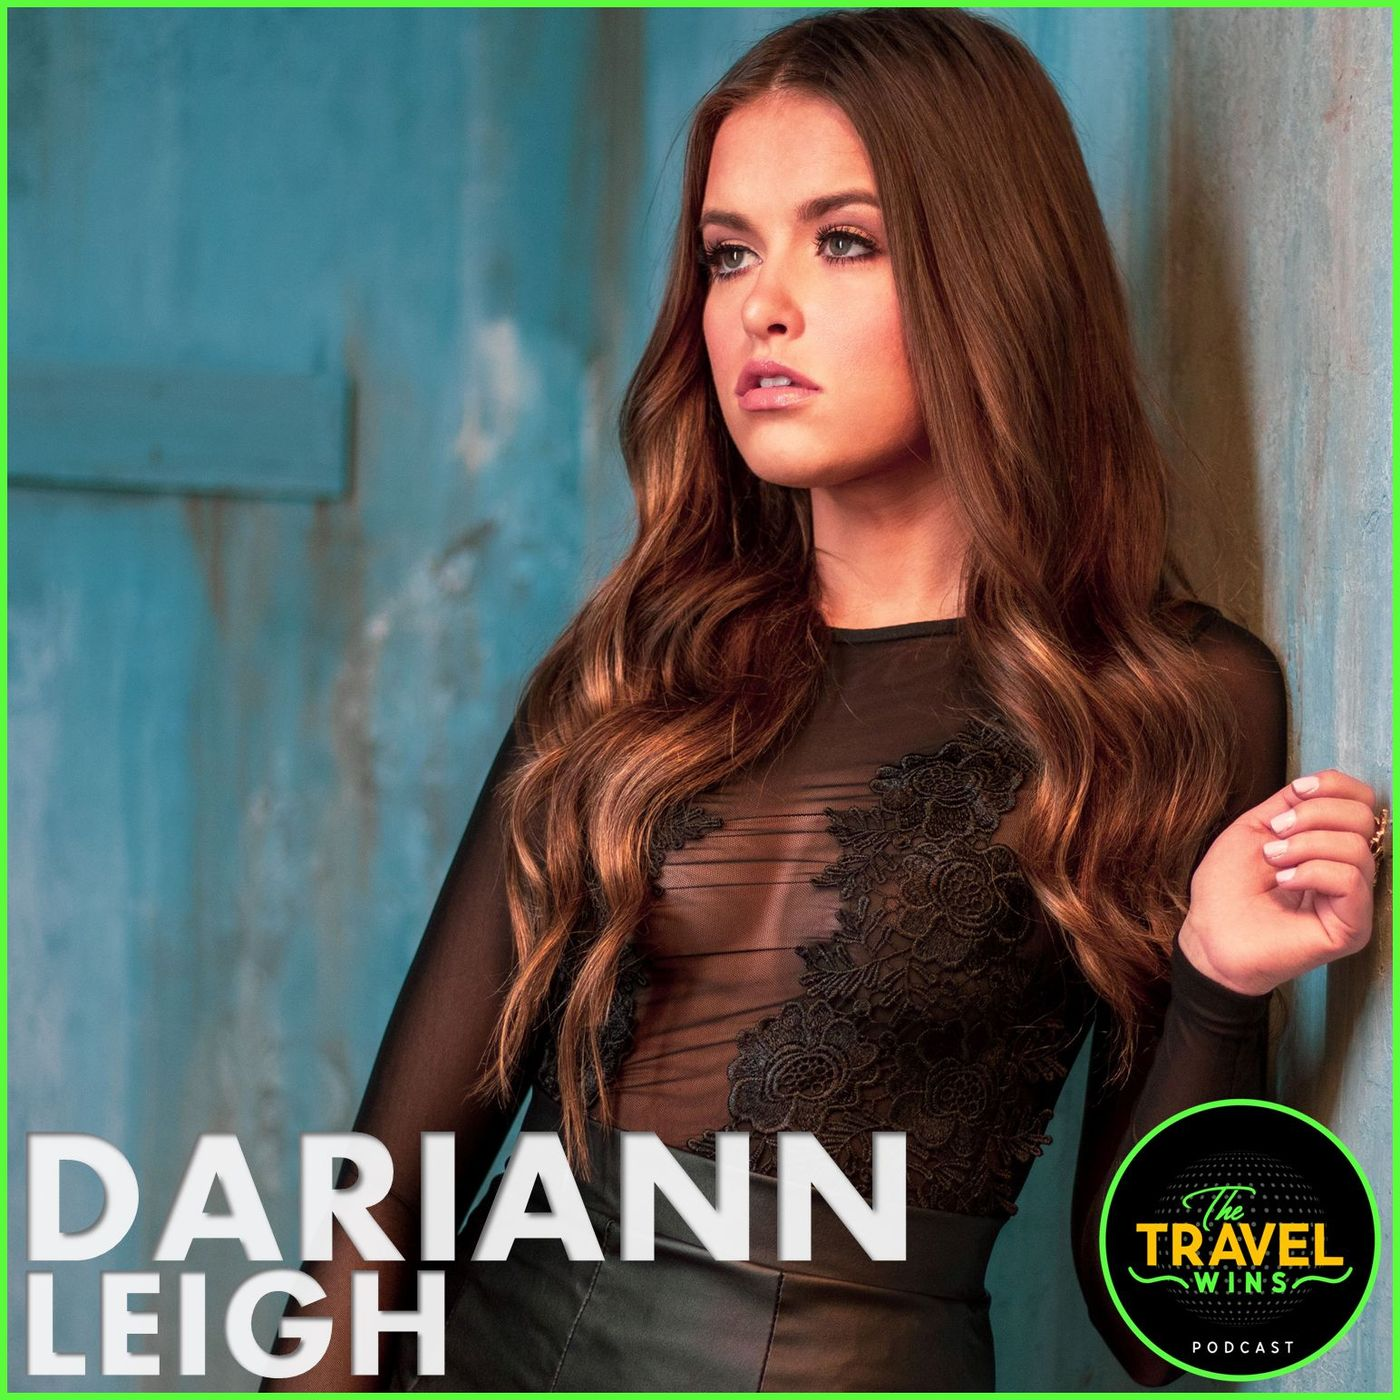 Dariann Leigh | Small Town Girl with Nashville Dreams